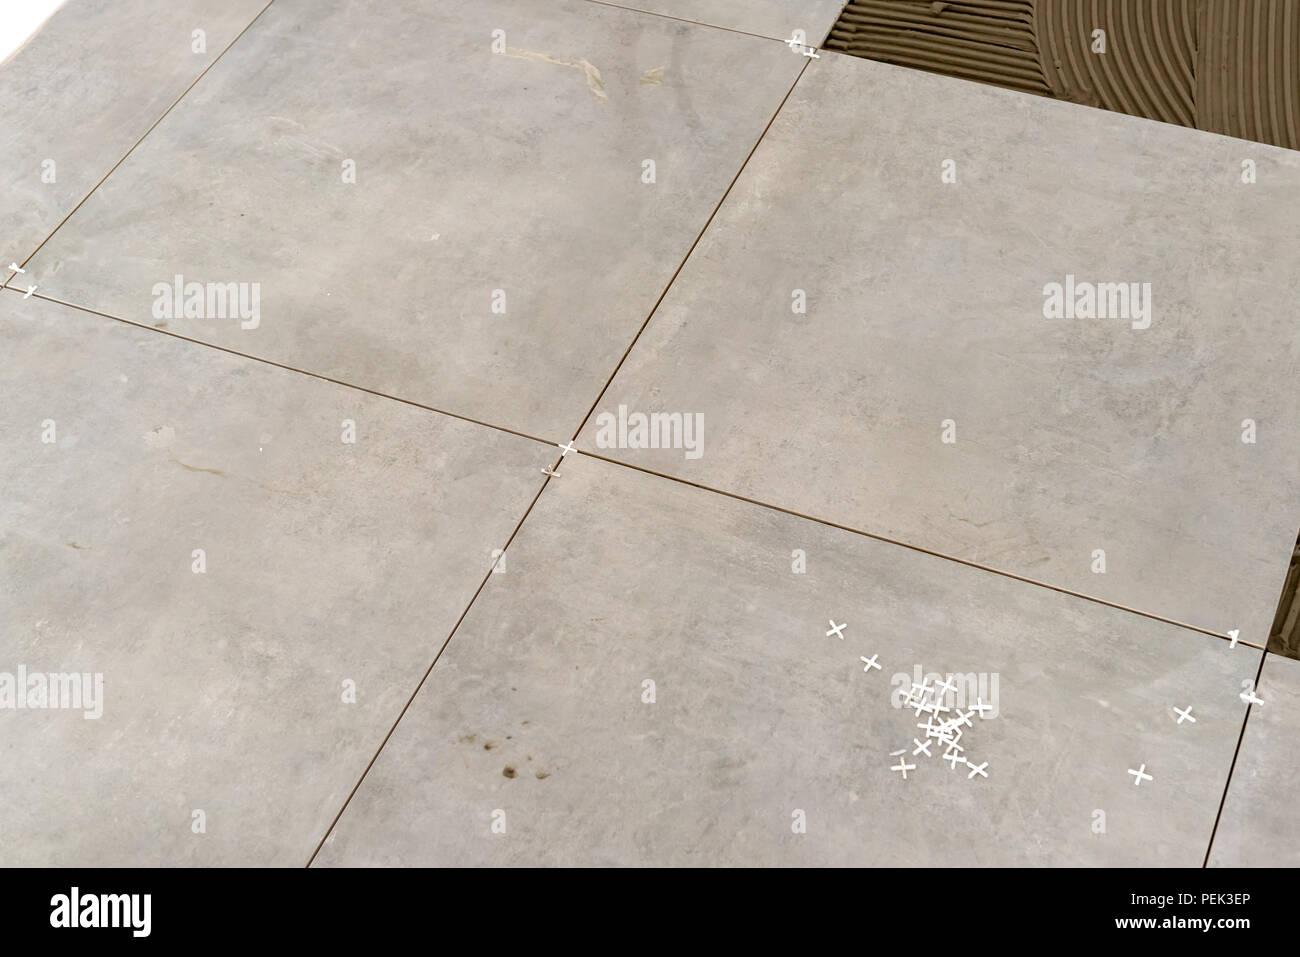 Ceramic Tiles Floor Tiles Installation In New Apartment Stock Photo